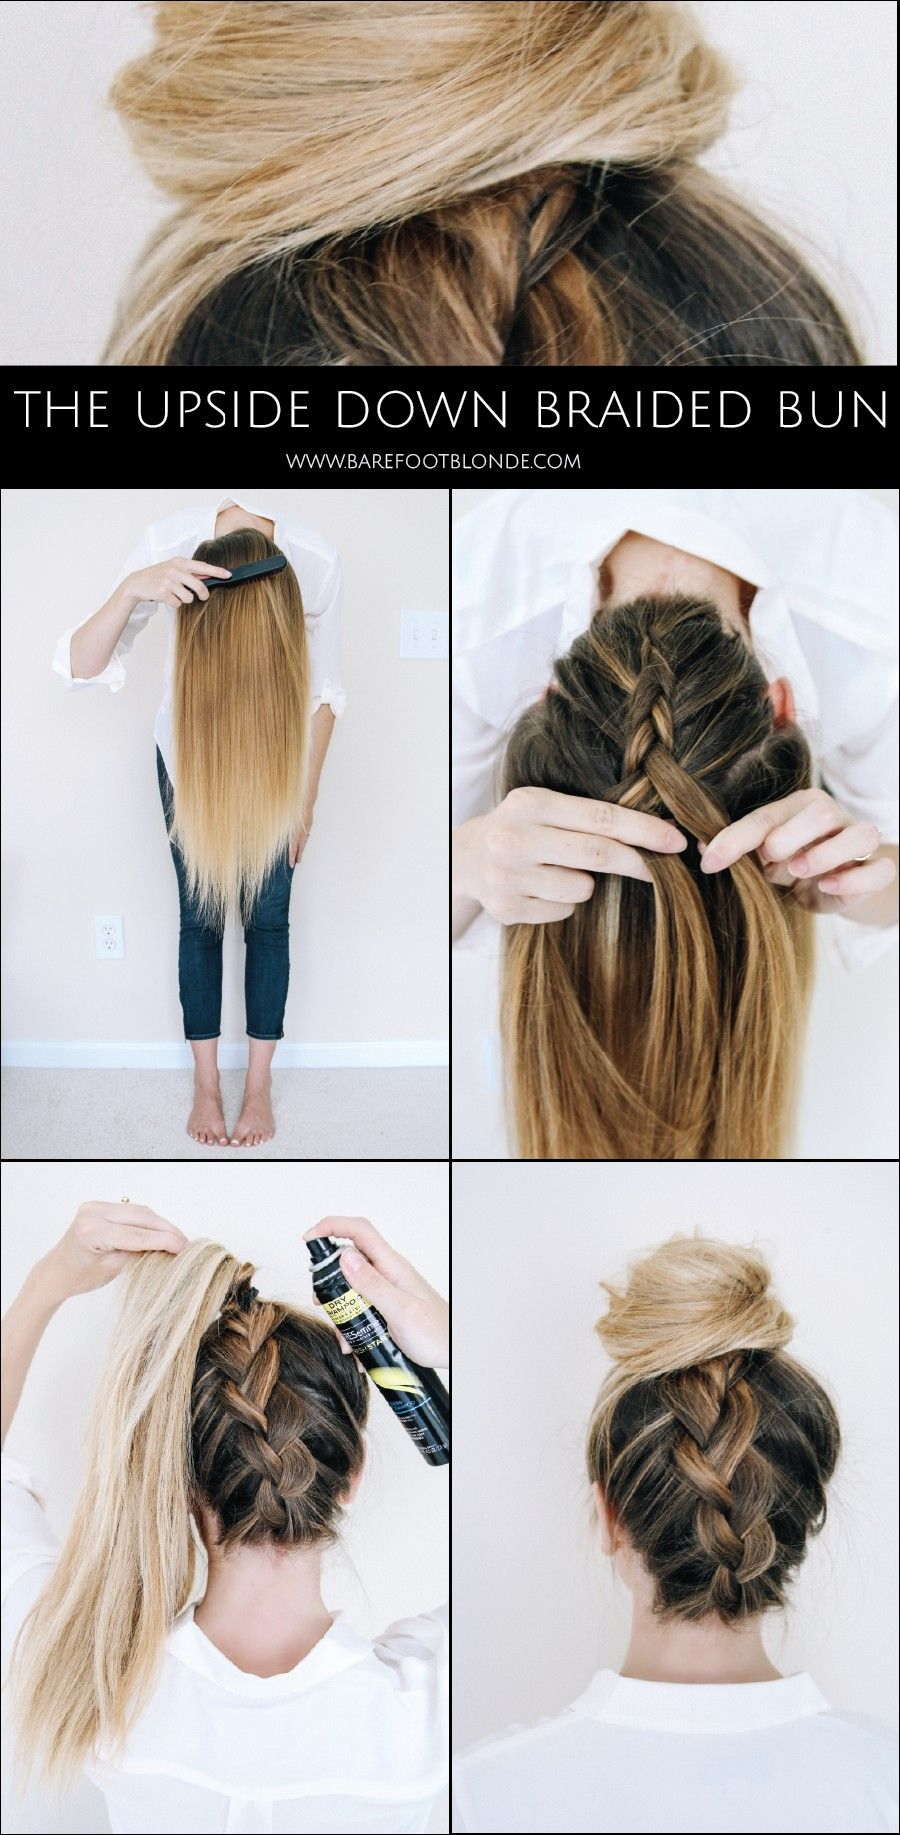 94 Wonderful Everyday Hairstyles That Very Easy 2020 In 2020 Medium Length Hair Styles Hairstyles For Medium Length Hair Easy Easy Hairstyles